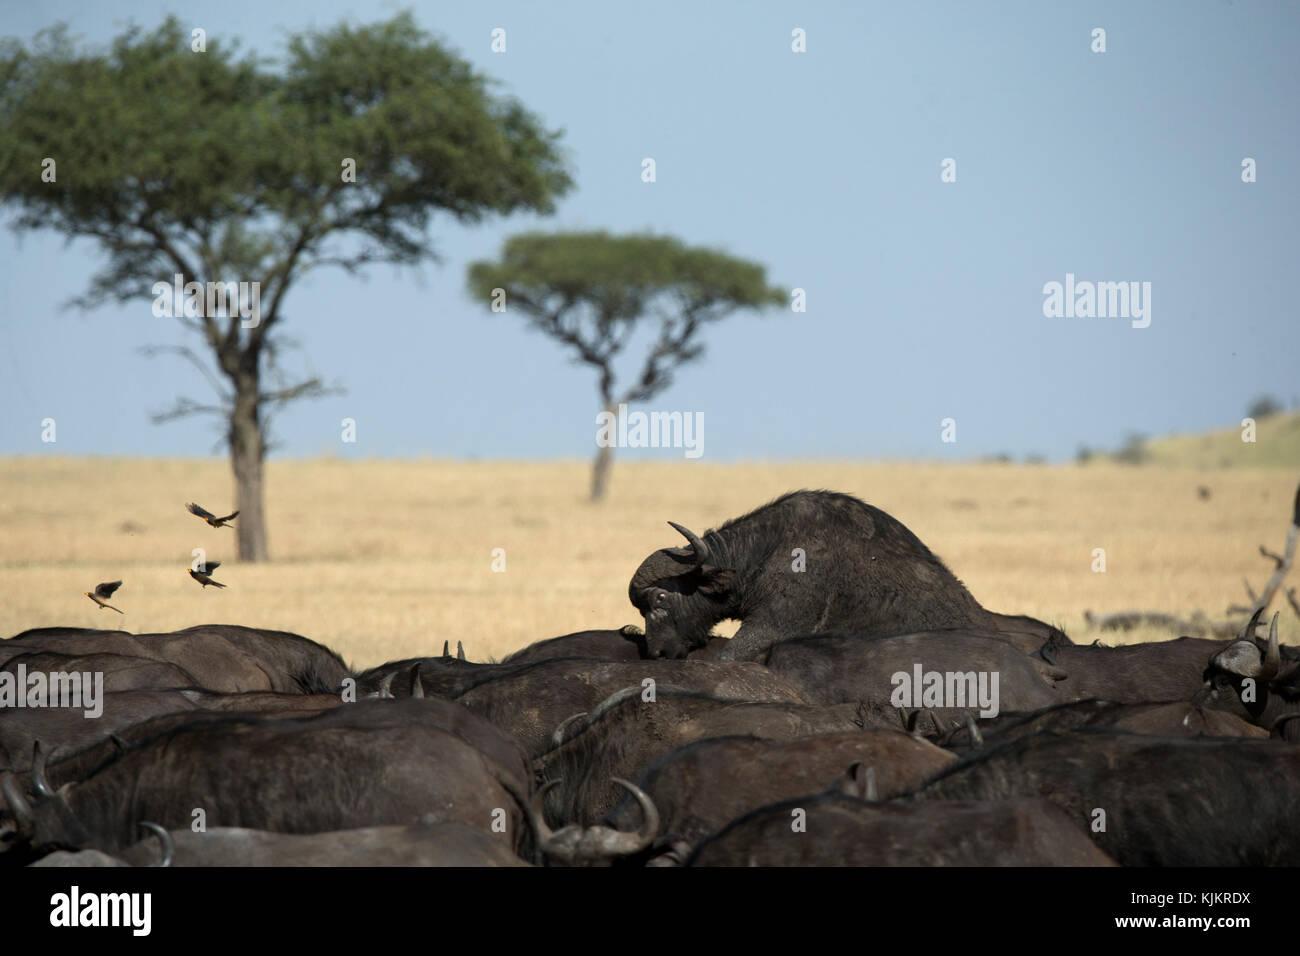 Serengeti National Park.  African Buffalos. Tanzania. - Stock Image